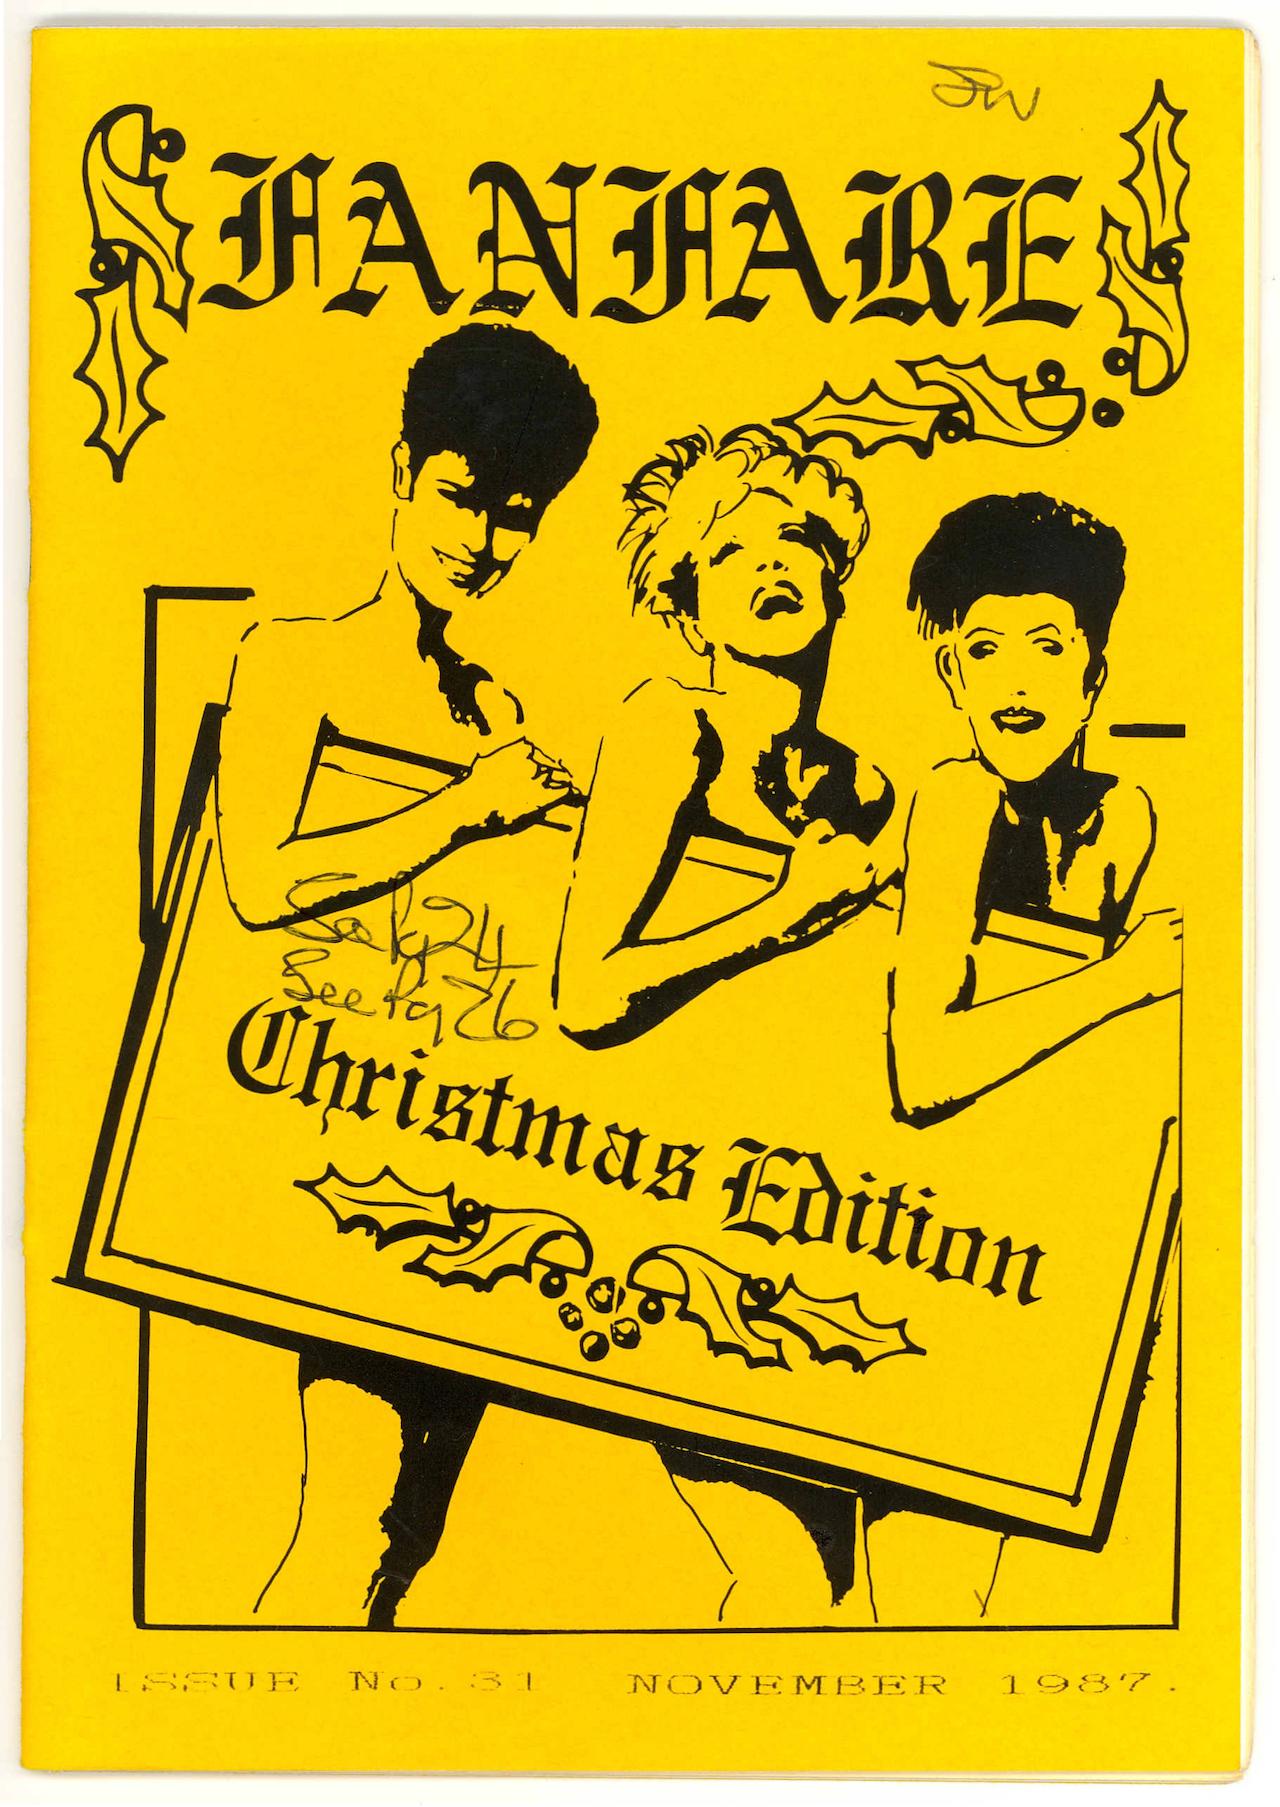 Cover of November 1987 issue of Fanfare Magazine (courtesy Gender DynamiX and Digital Transgender Archive)